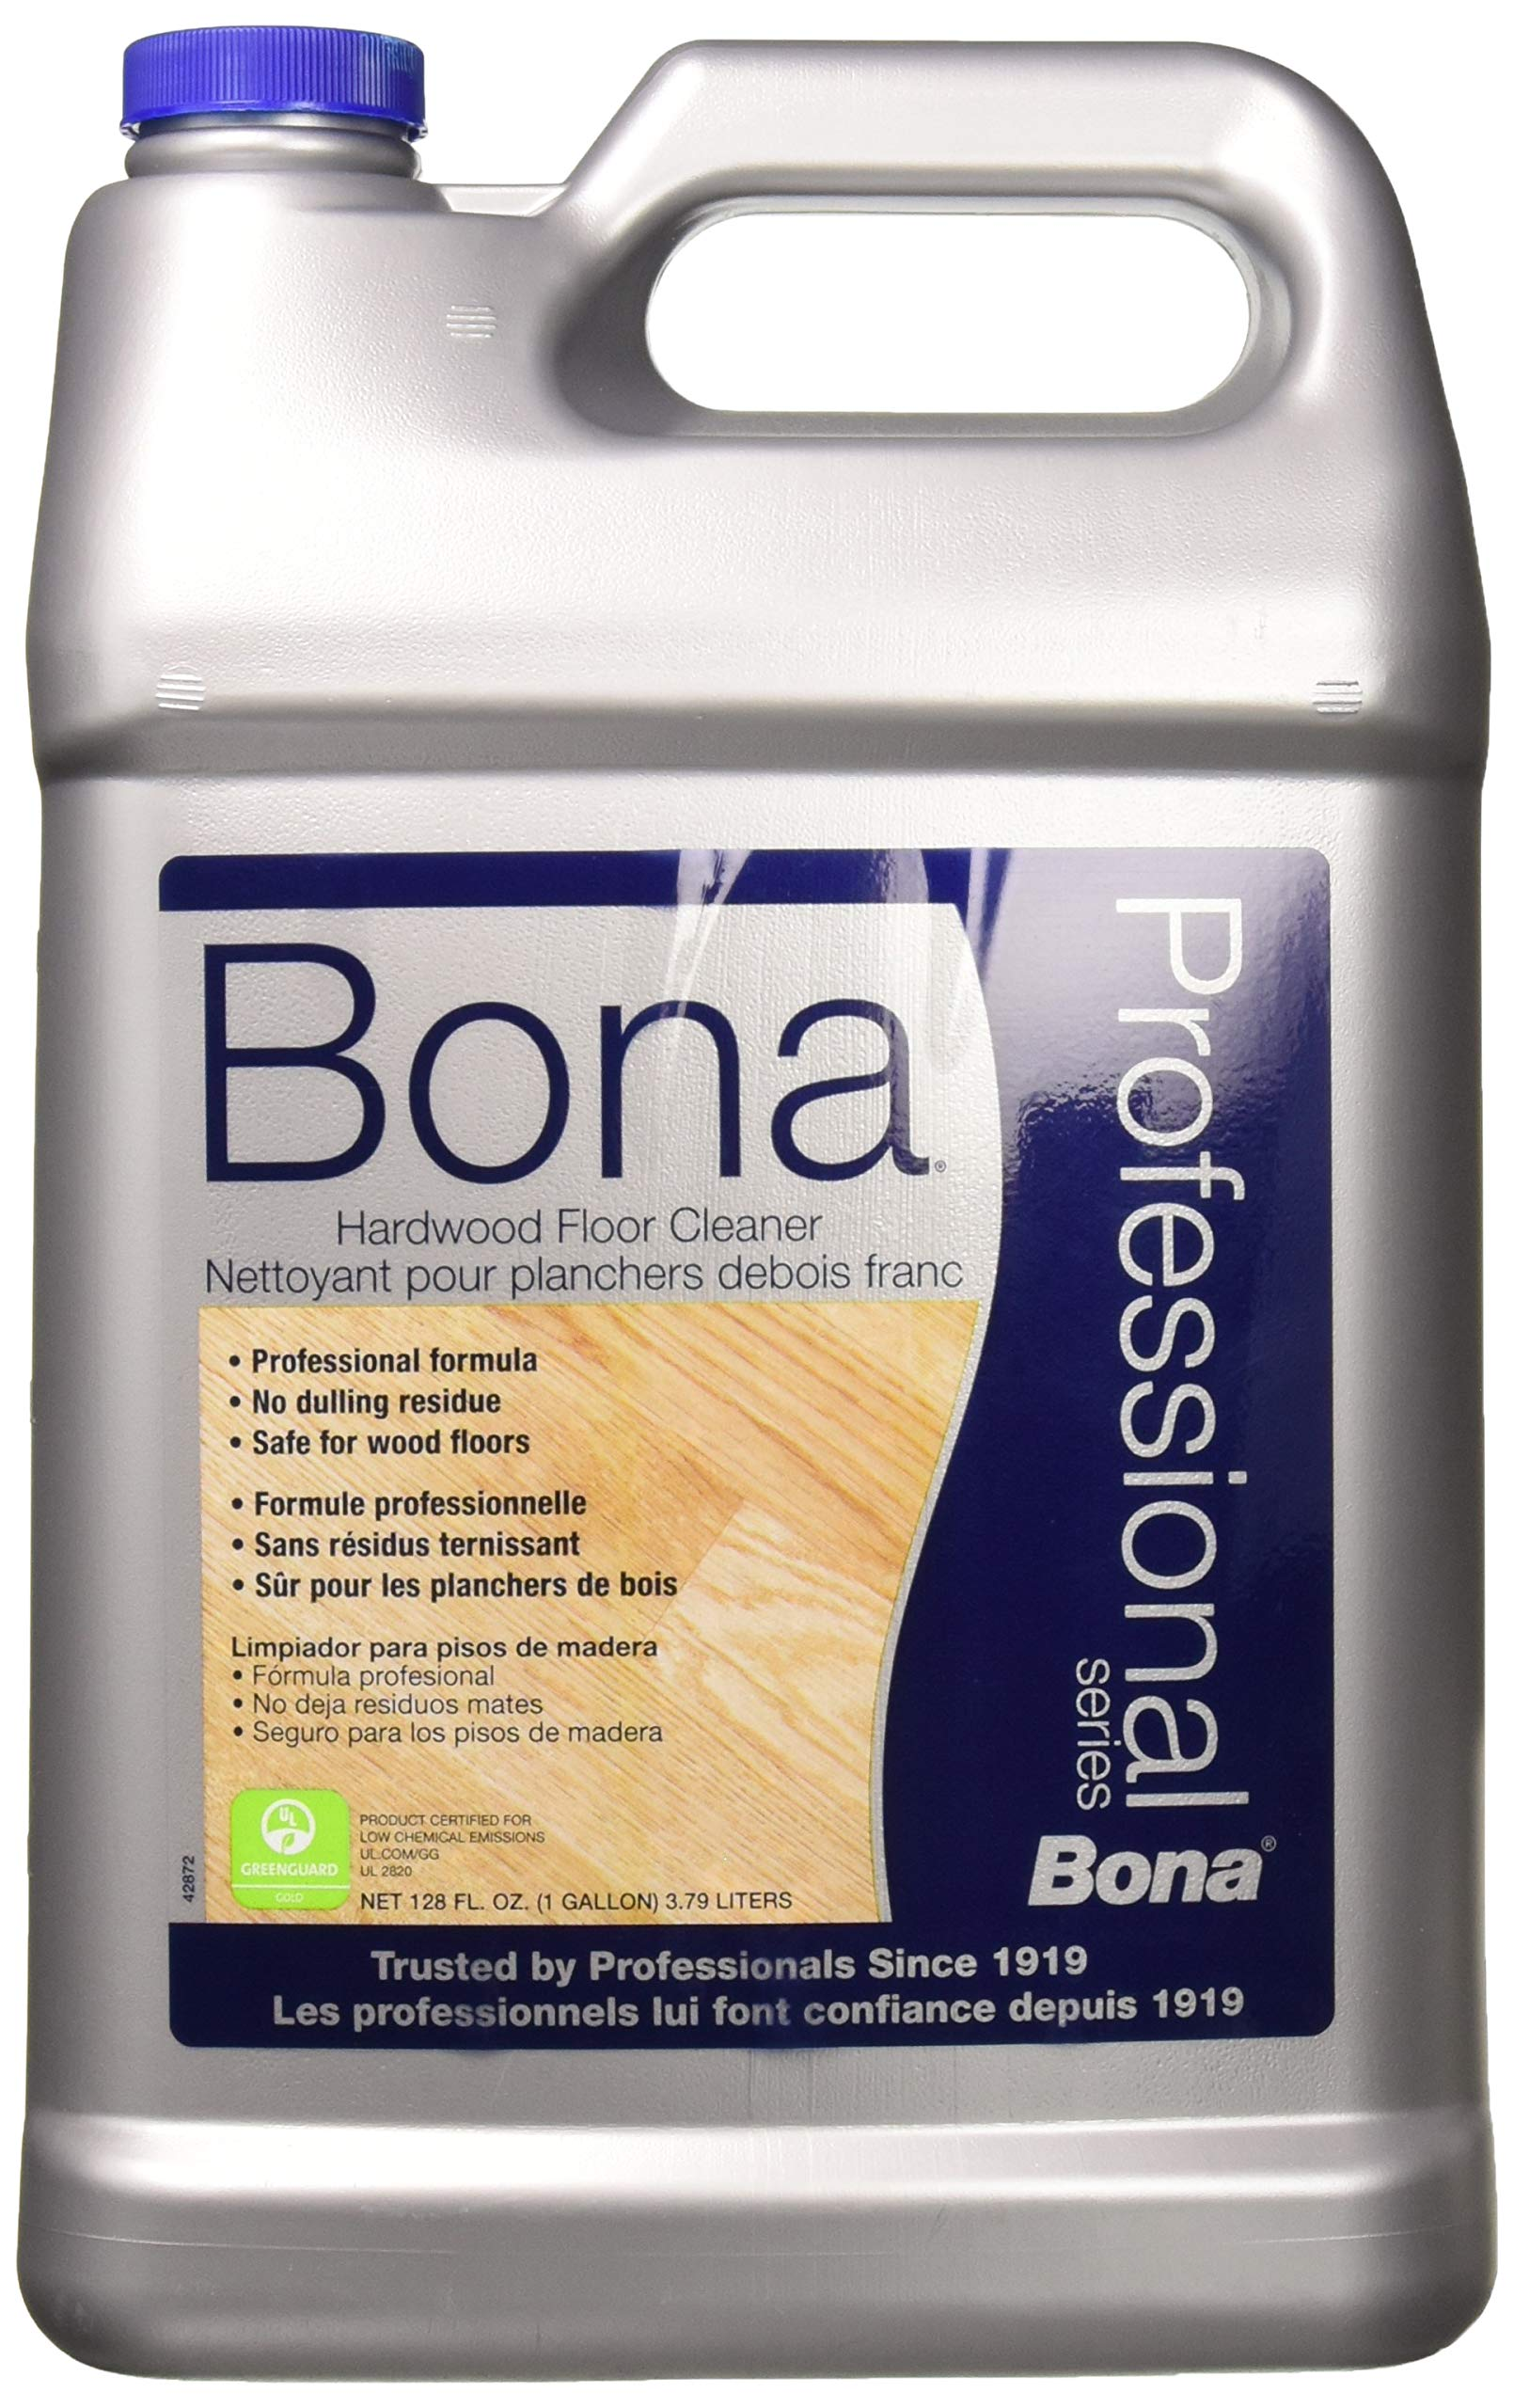 Amazoncom Bona Pro Series Wt Hardwood Floor Refresher - Mate flex flooring